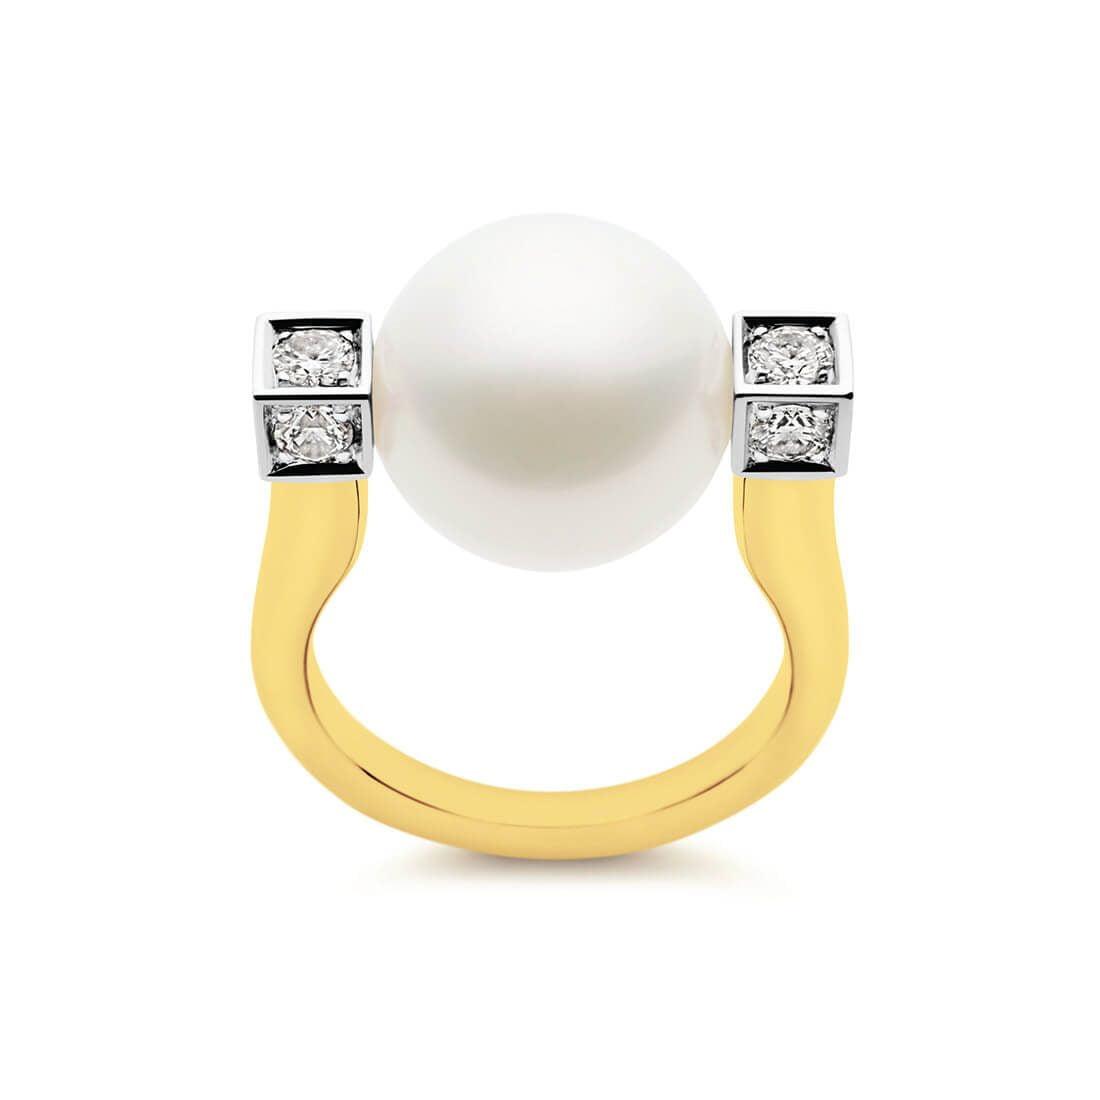 Kailis - Luna Ring, Yellow Gold